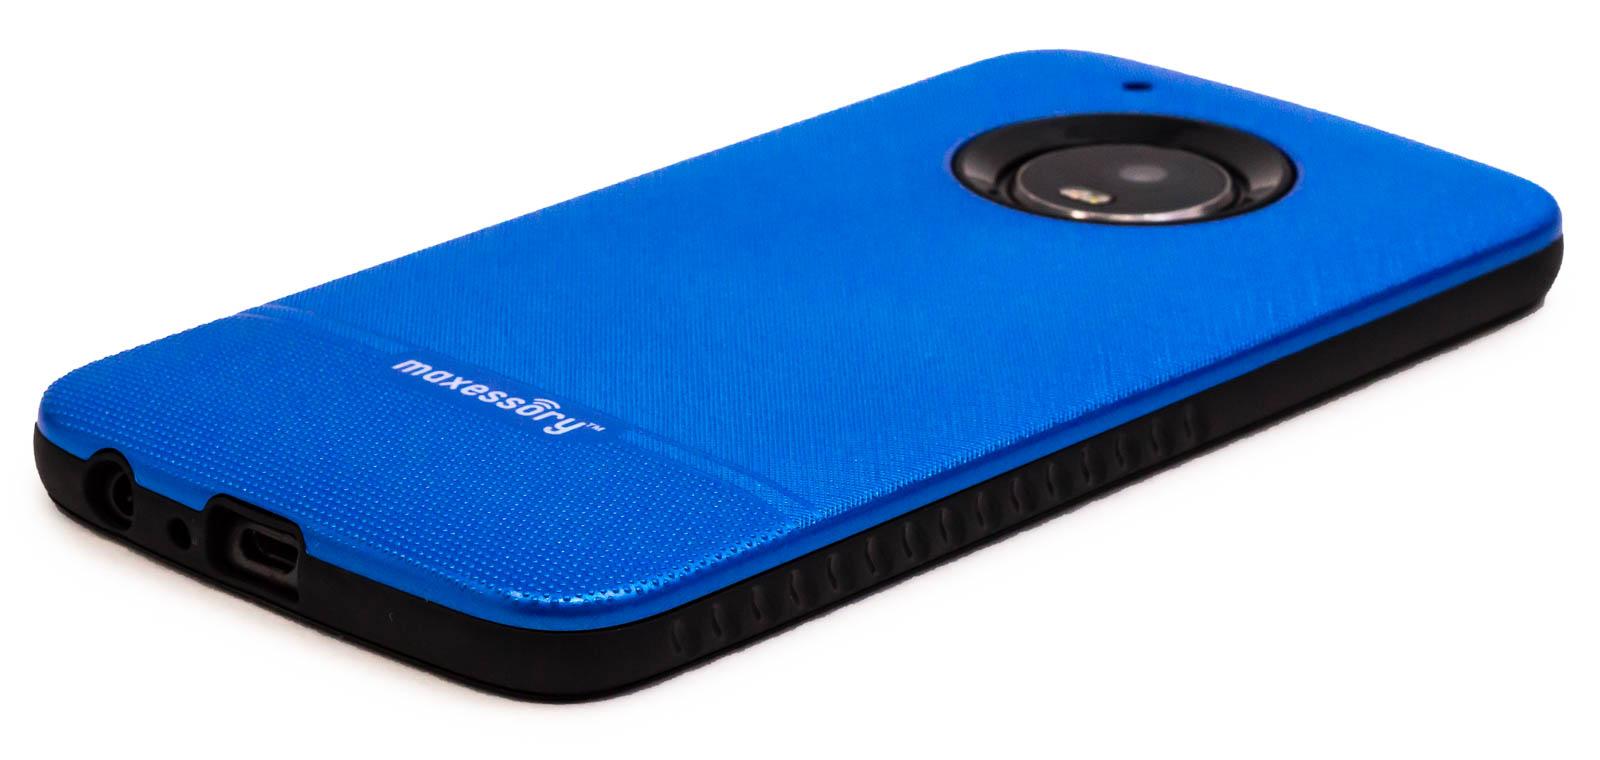 Moto-G5-Plus-Case-Moto-X-17-Case-Ultra-Thin-Hard-Body-Tactile-Shell-Cover thumbnail 10